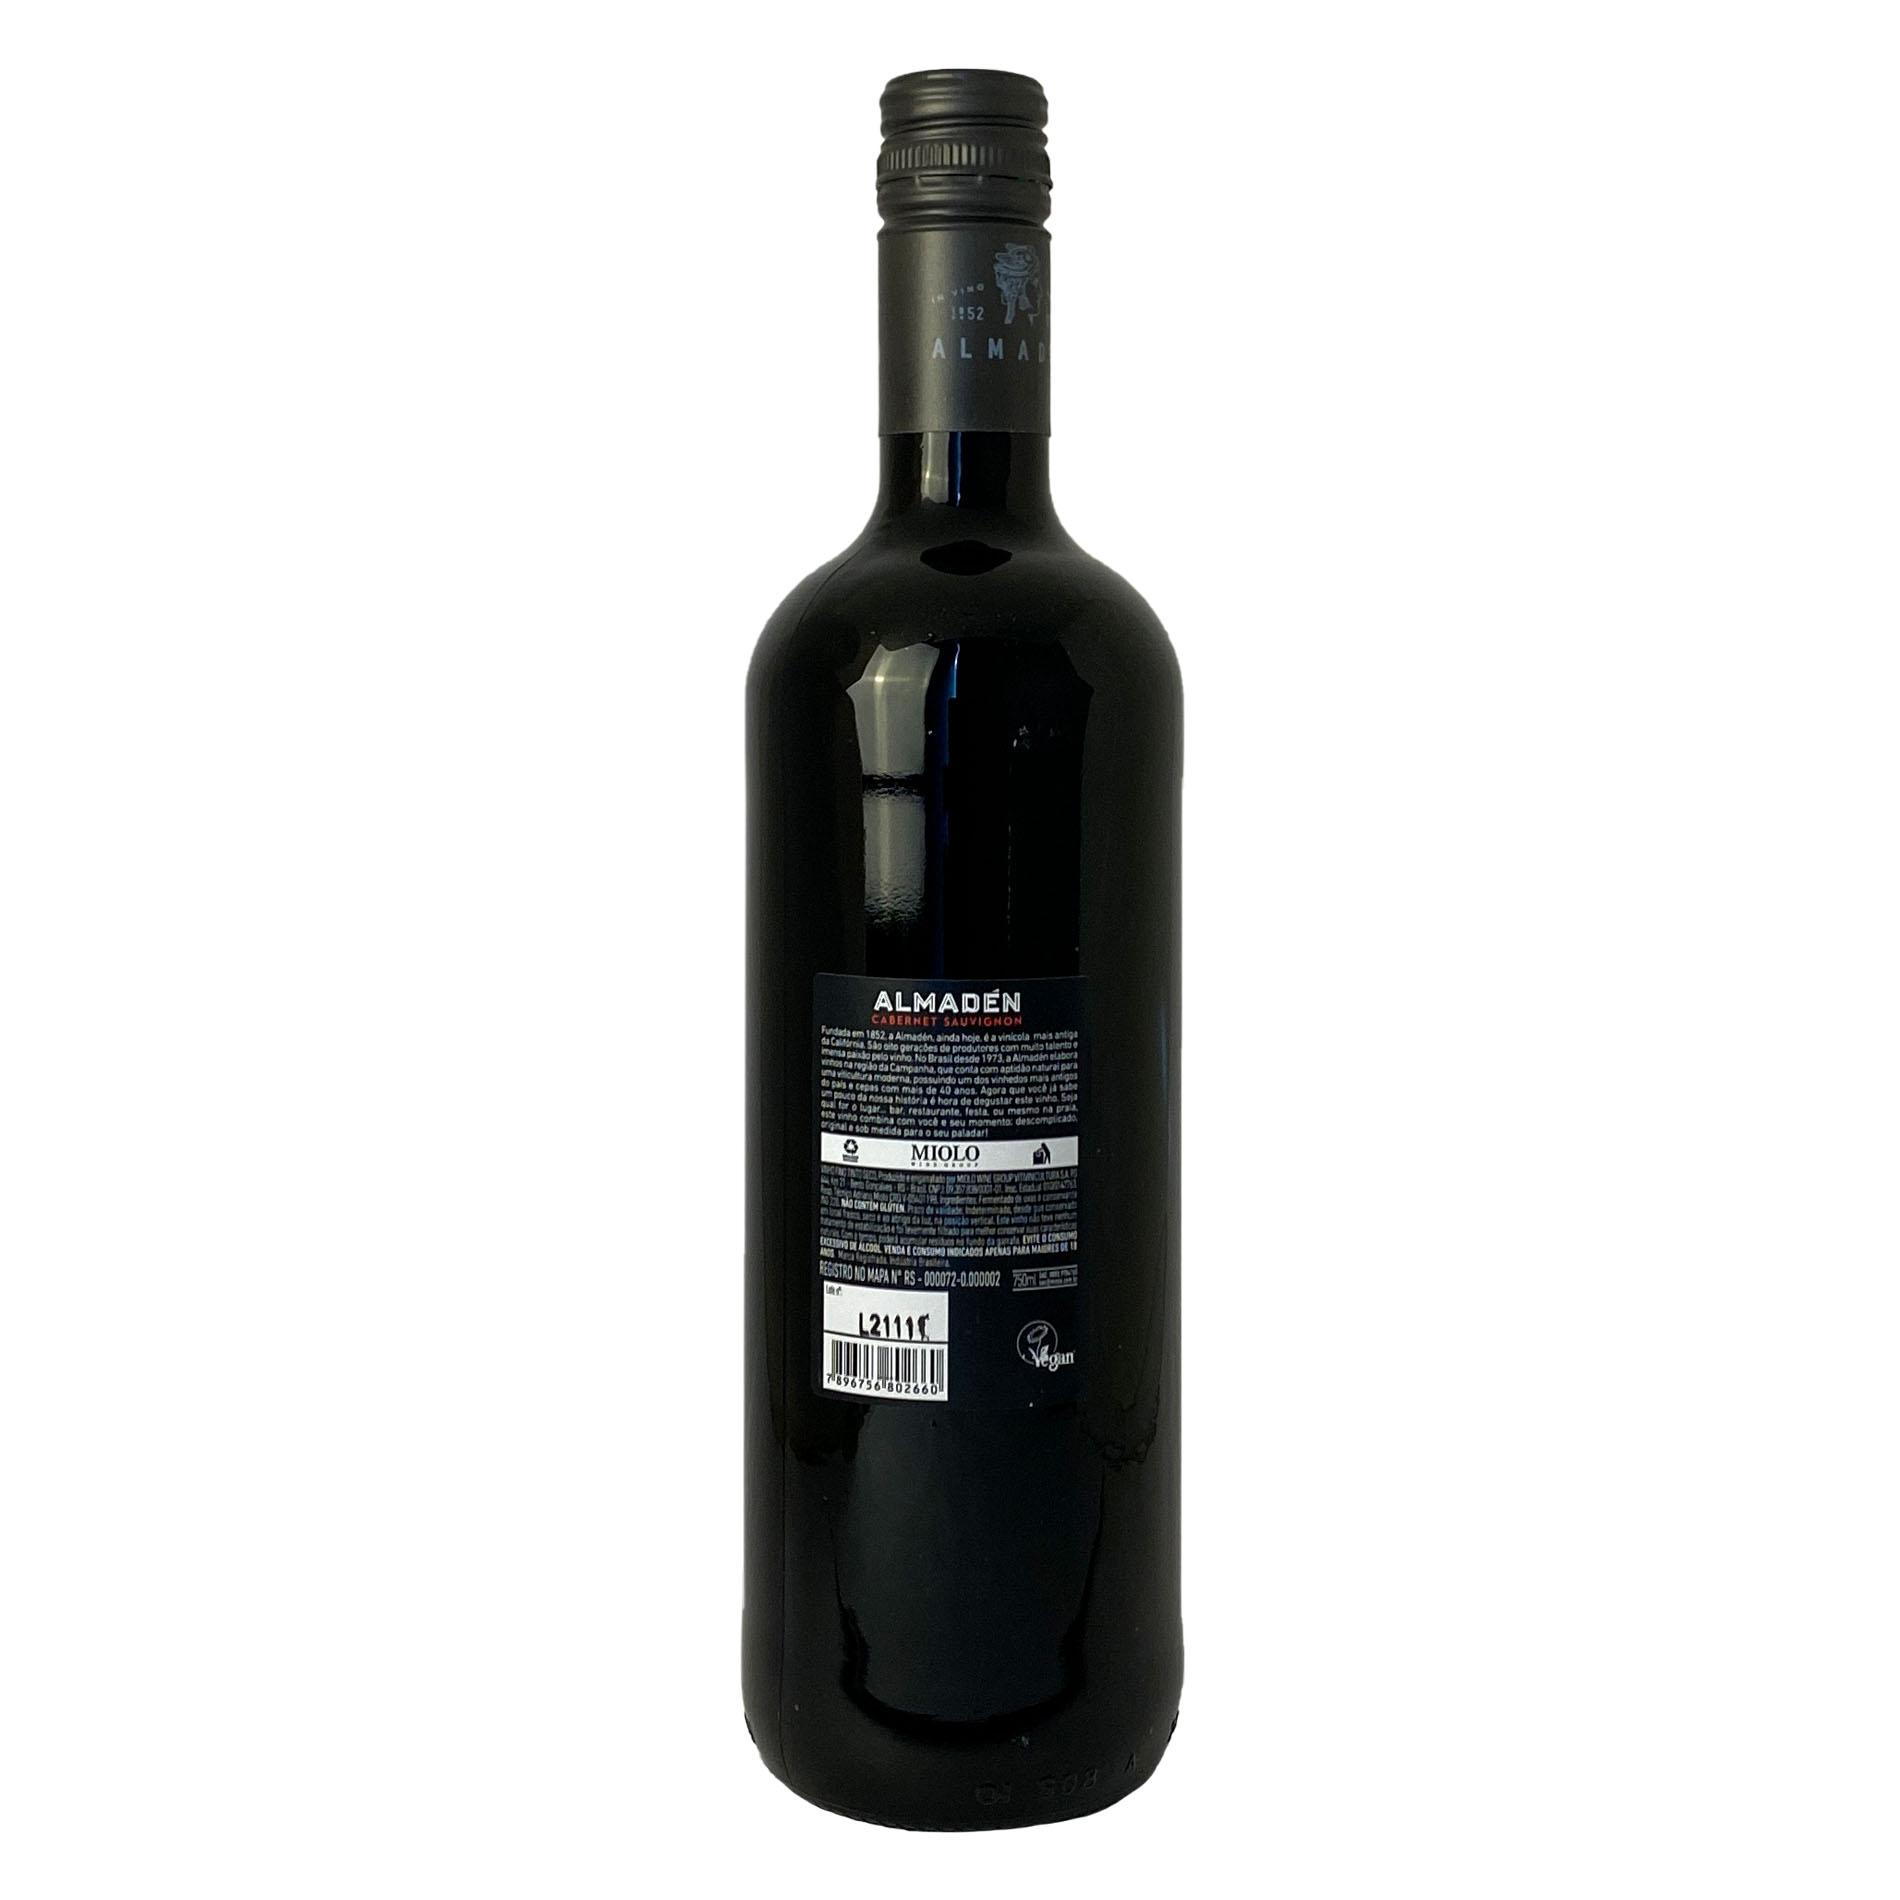 Almadén Cabernet Sauvignon  - Vinerize